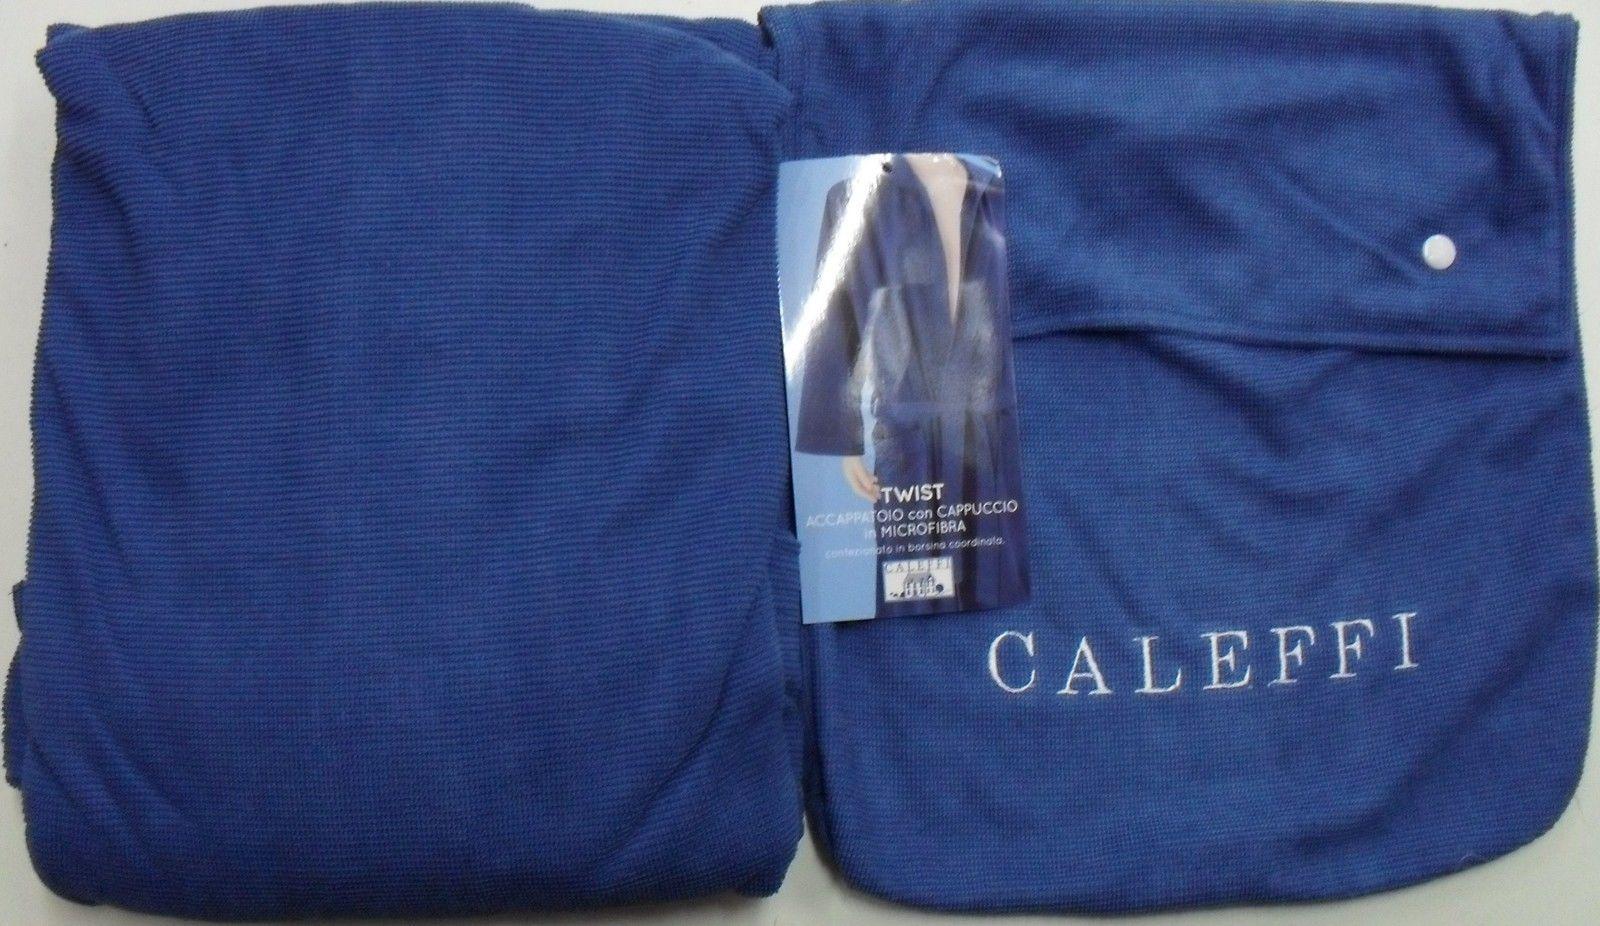 Spugne Da Bagno Caleffi : Asciugamani e accessori da bagno arredamento design